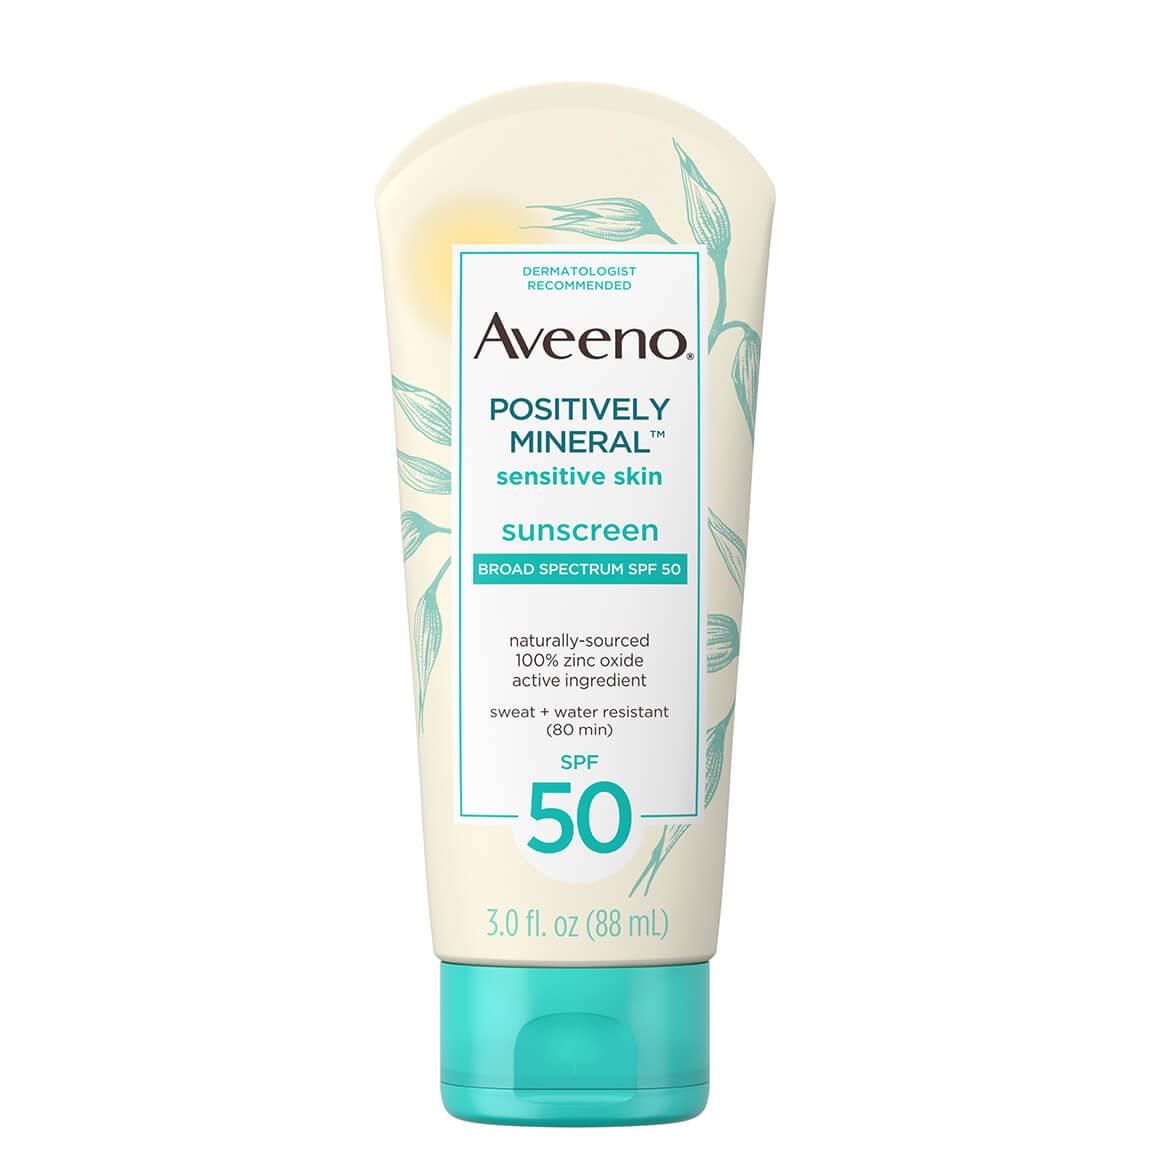 Aveeno Positively Mineral Sensitive Skin Sunscreen SPF50